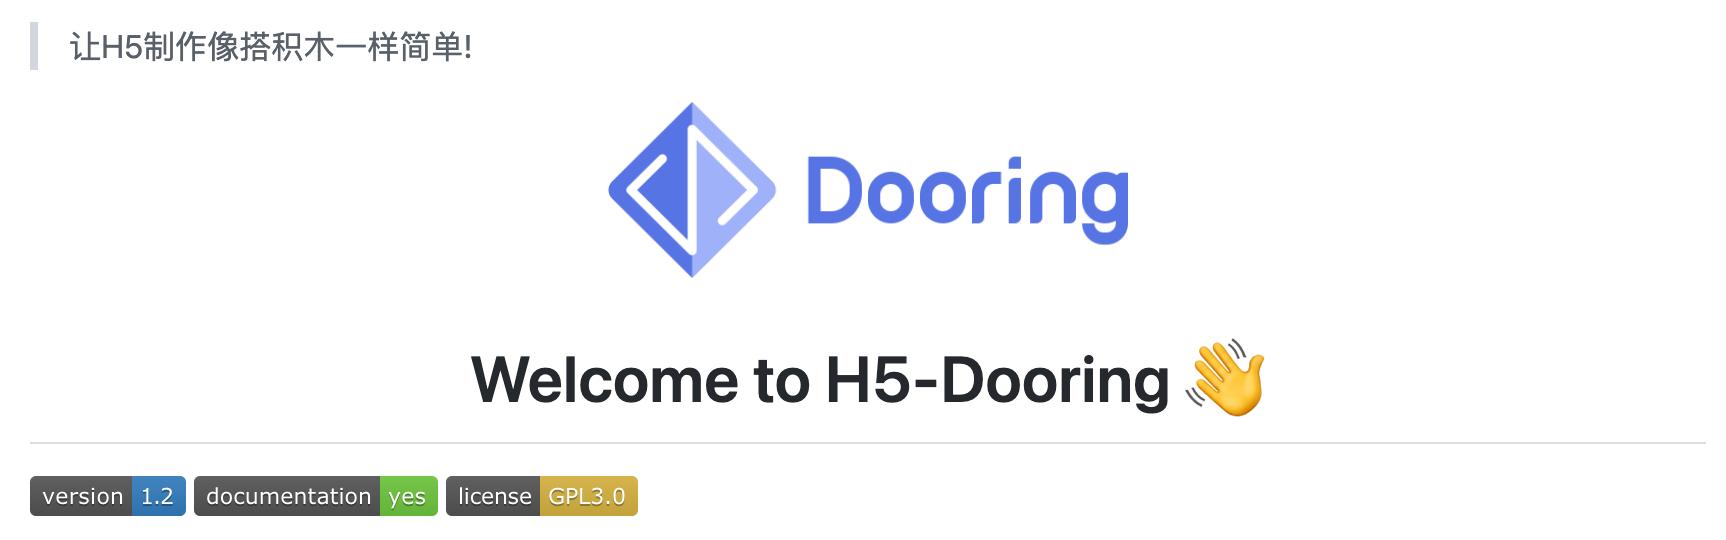 lowcode开发者社区